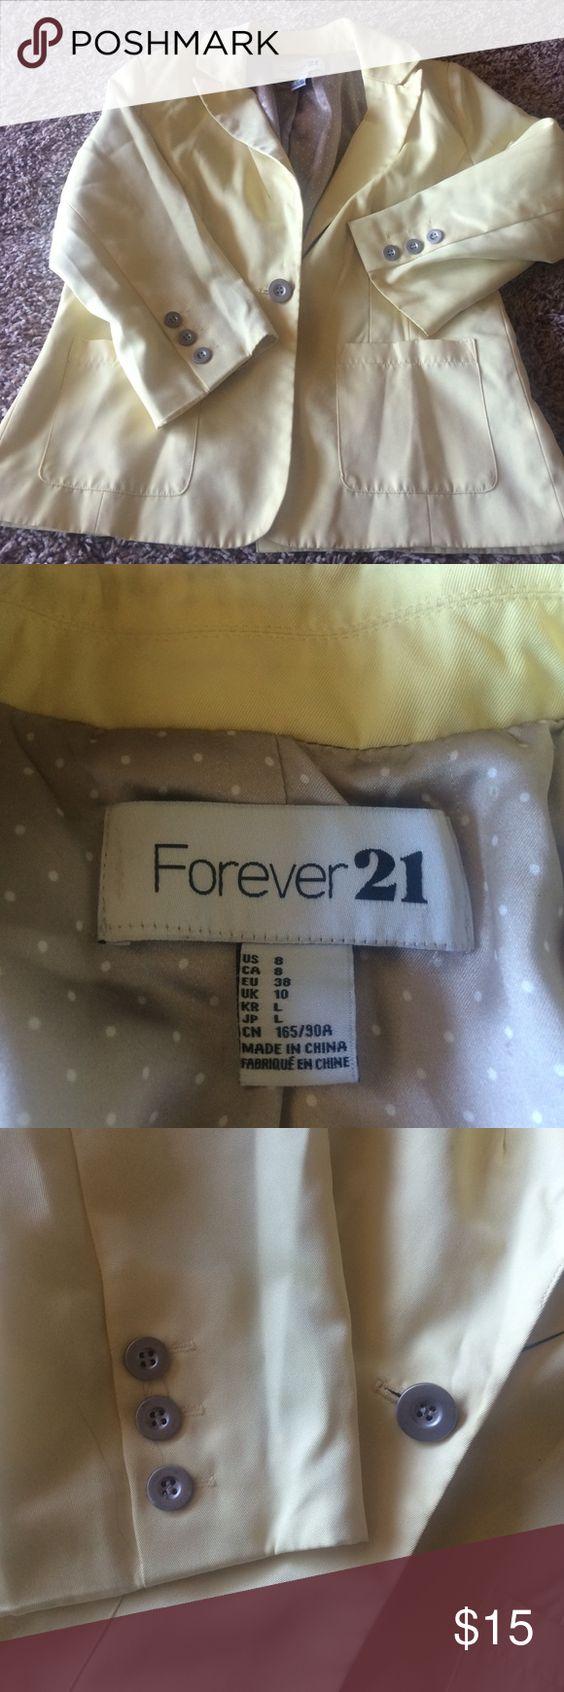 Blazer Forever 21 yellow dual pocket accent blazer! Like new barely worn ! Polka dot lining! Forever 21 Jackets & Coats Blazers